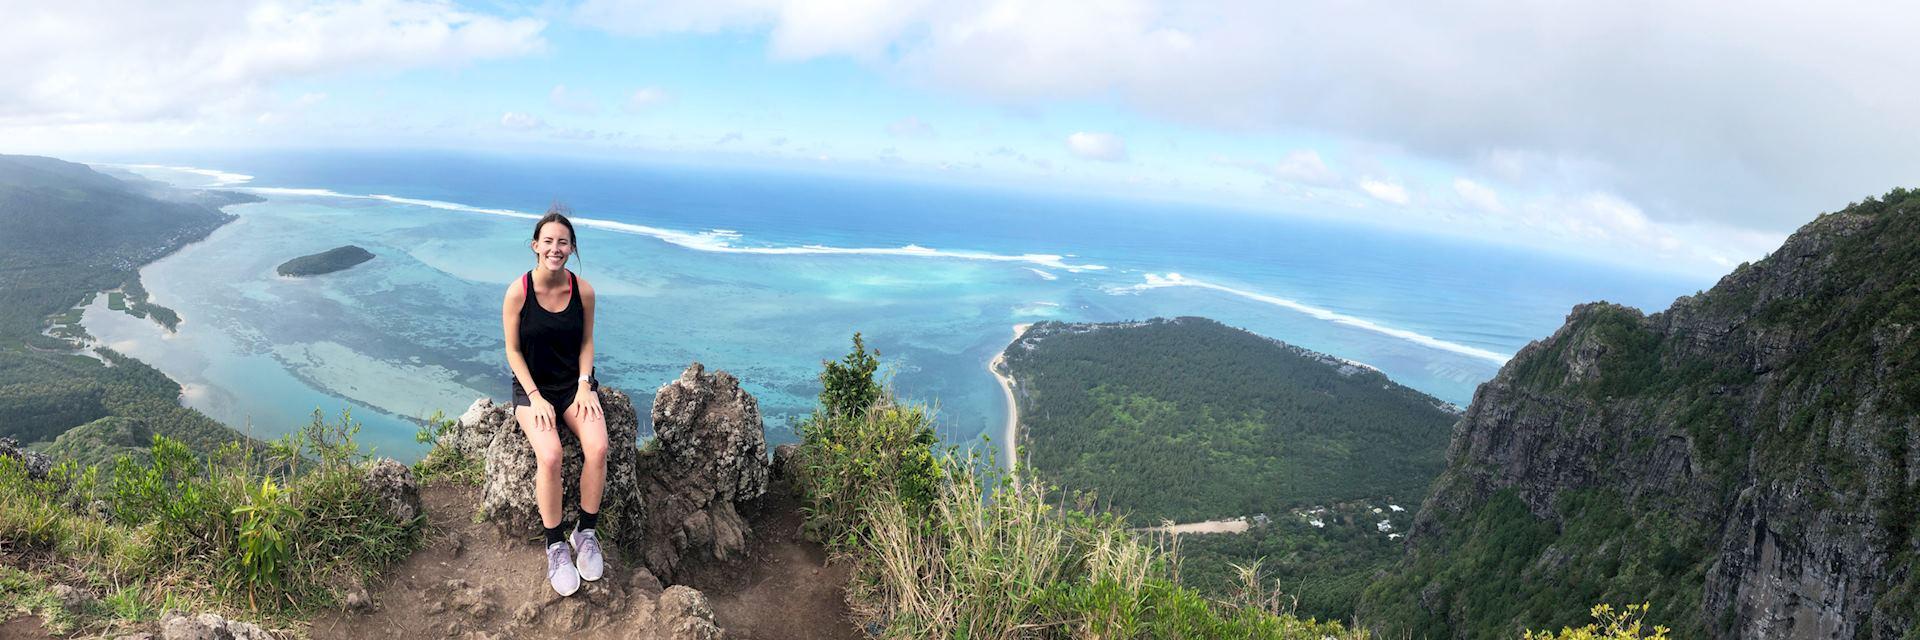 Laura at Le More, Mauritius